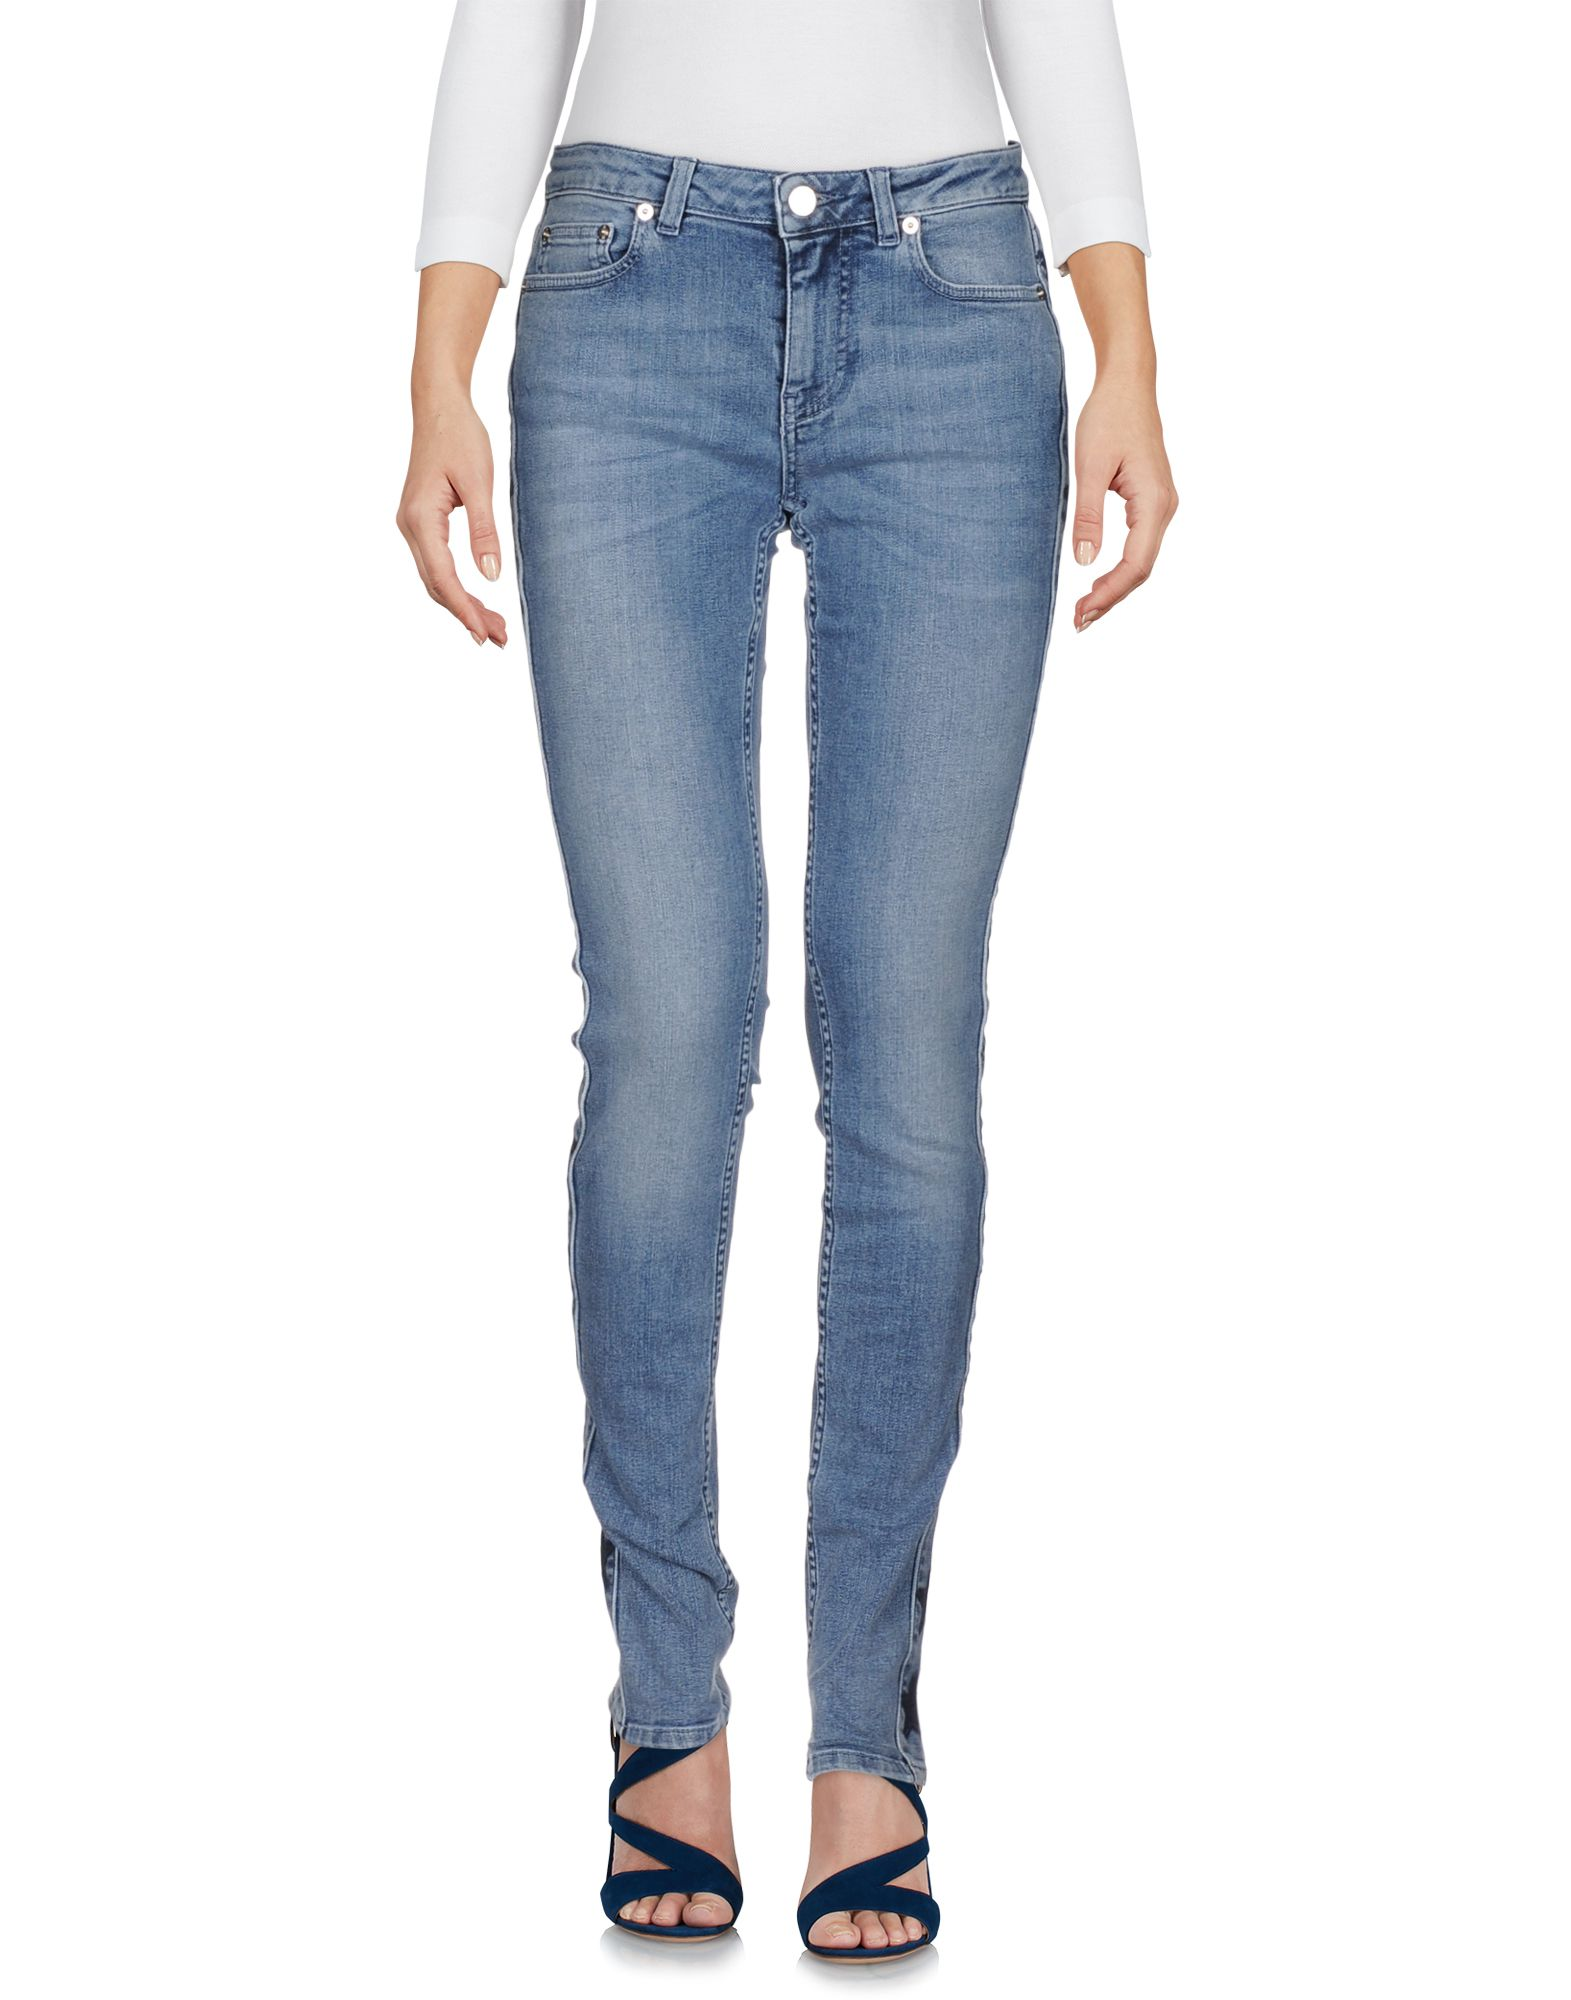 Pantaloni Jeans Givenchy Donna - Acquista online su O0BgoT21B4